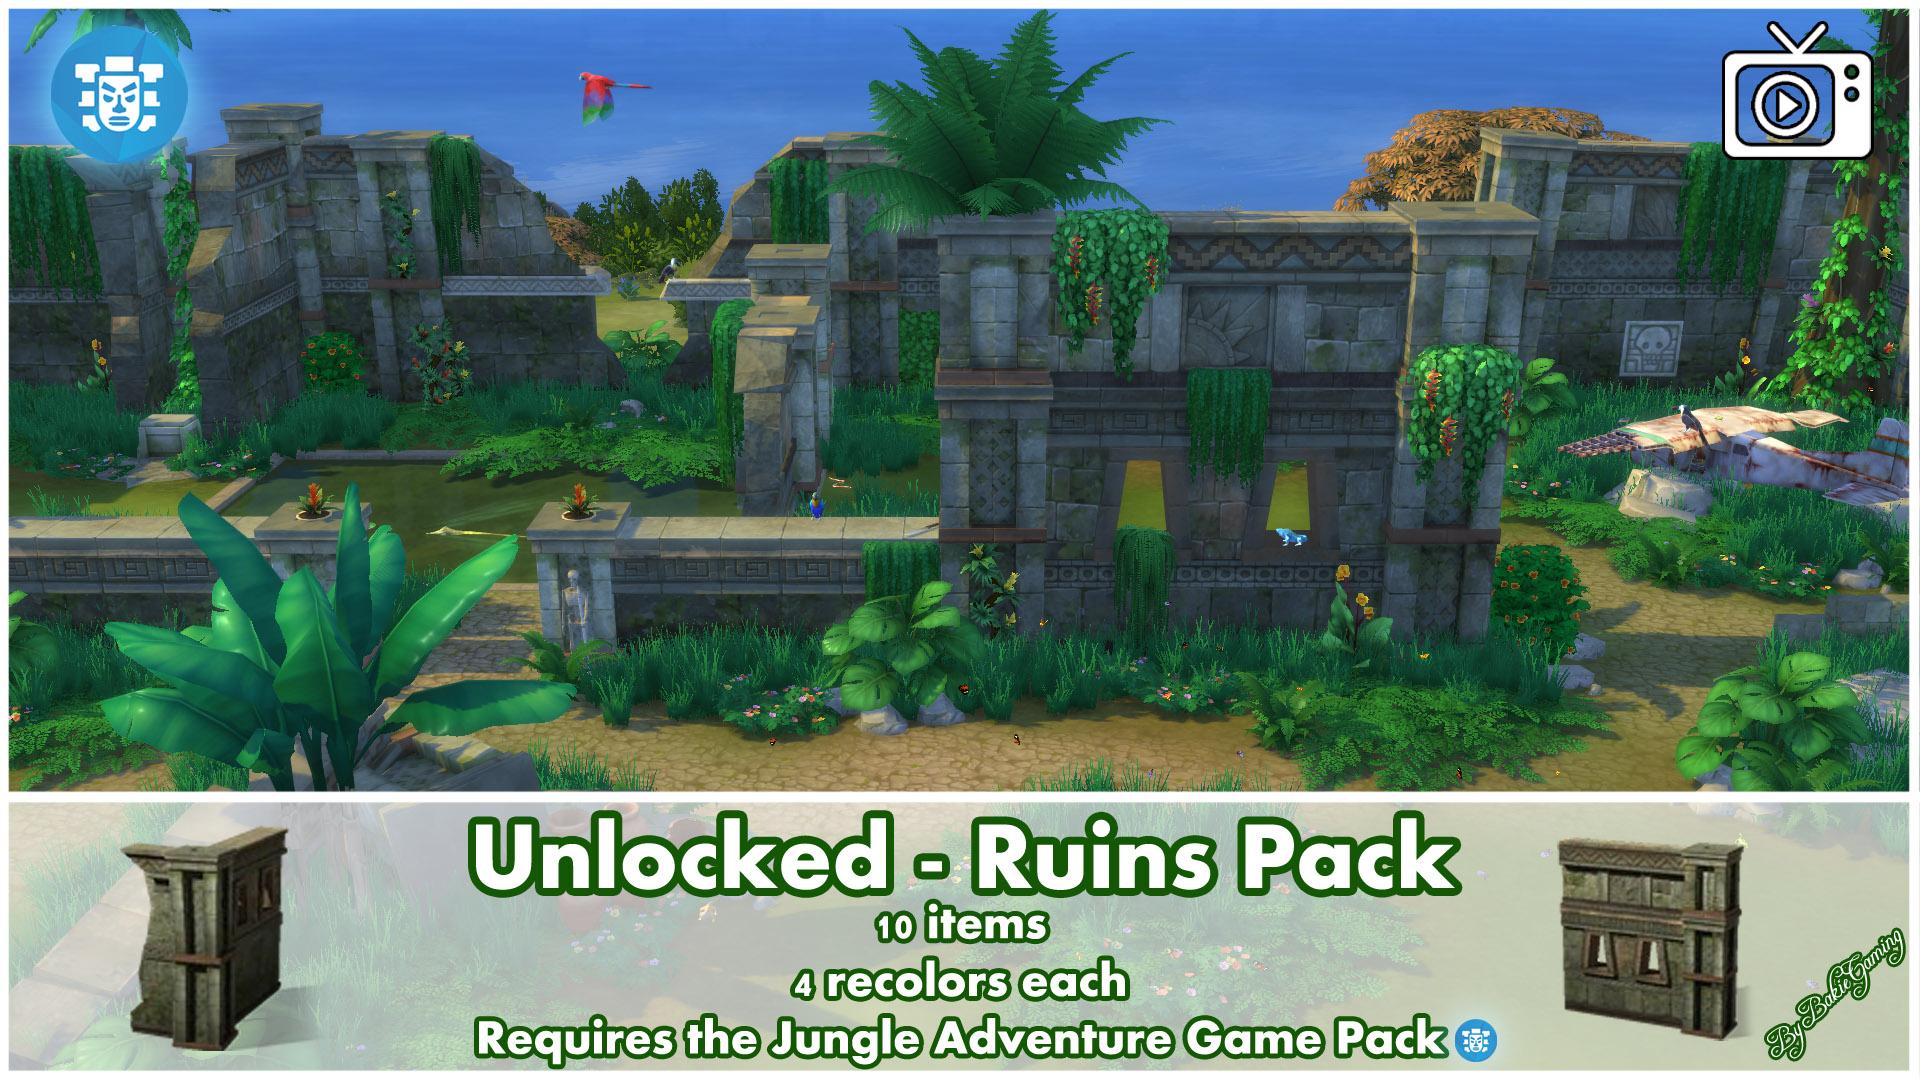 ModTheSims - Unlocked - Ruins Pack - Jungle Adventure